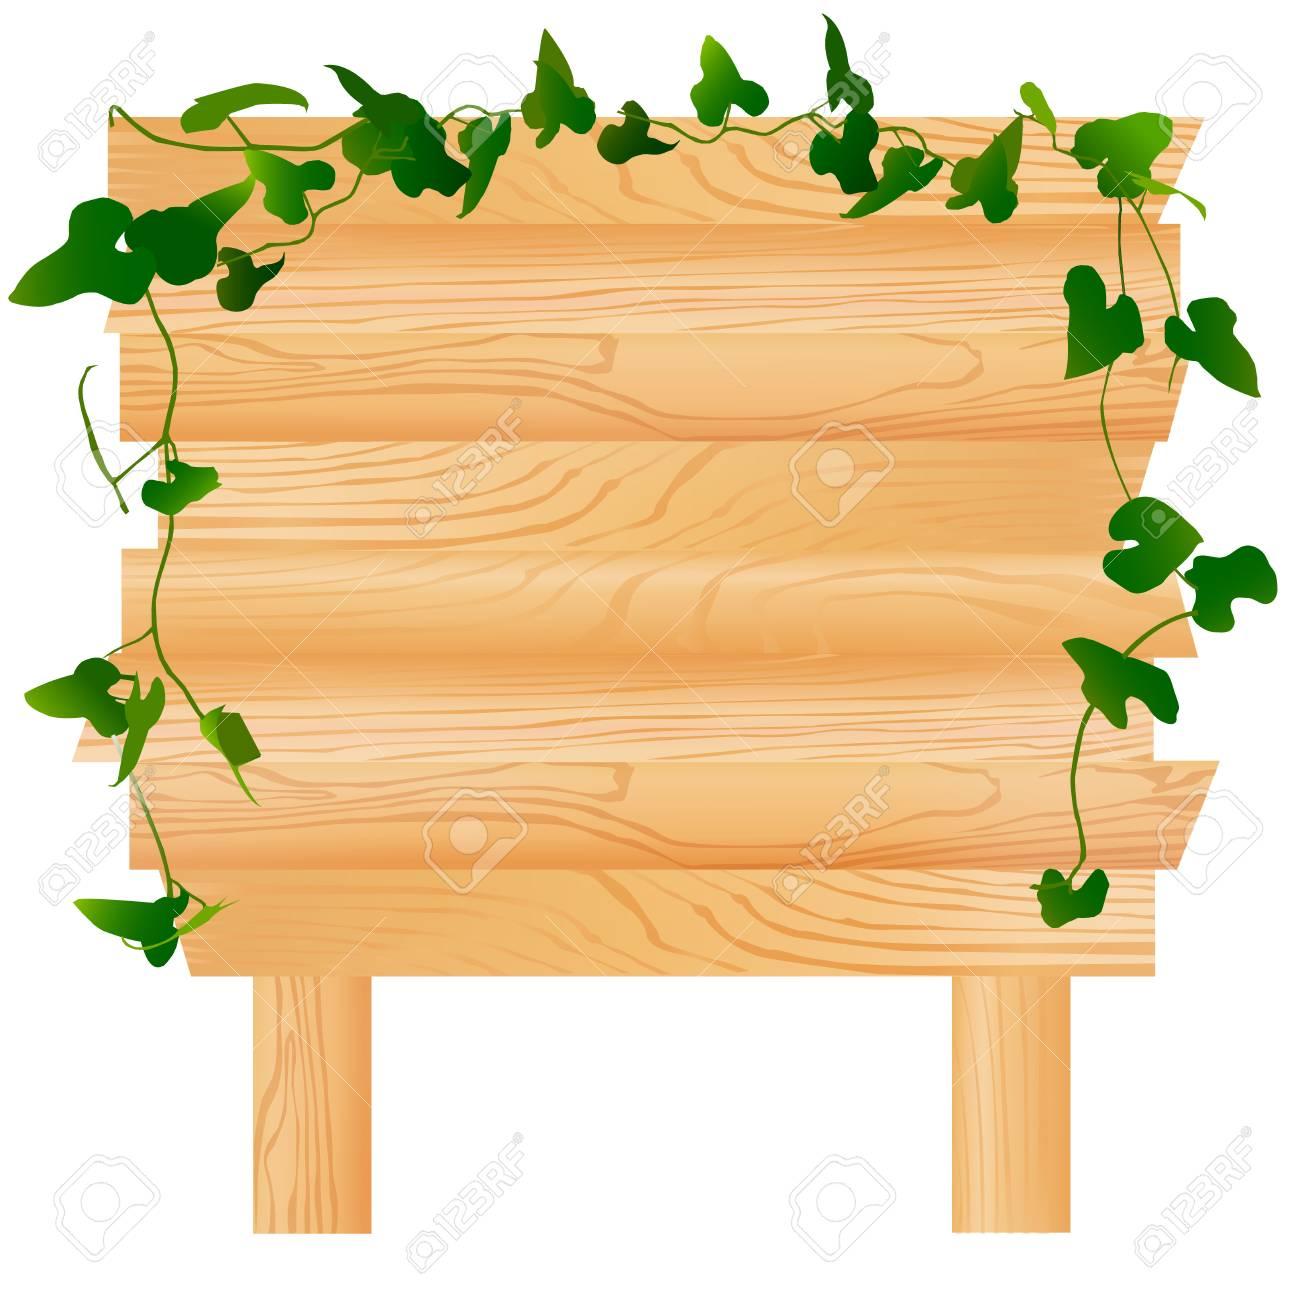 wood grain sign board icon royalty free cliparts vectors and stock rh 123rf com wood grain vector illustrator wood grain vector illustrator